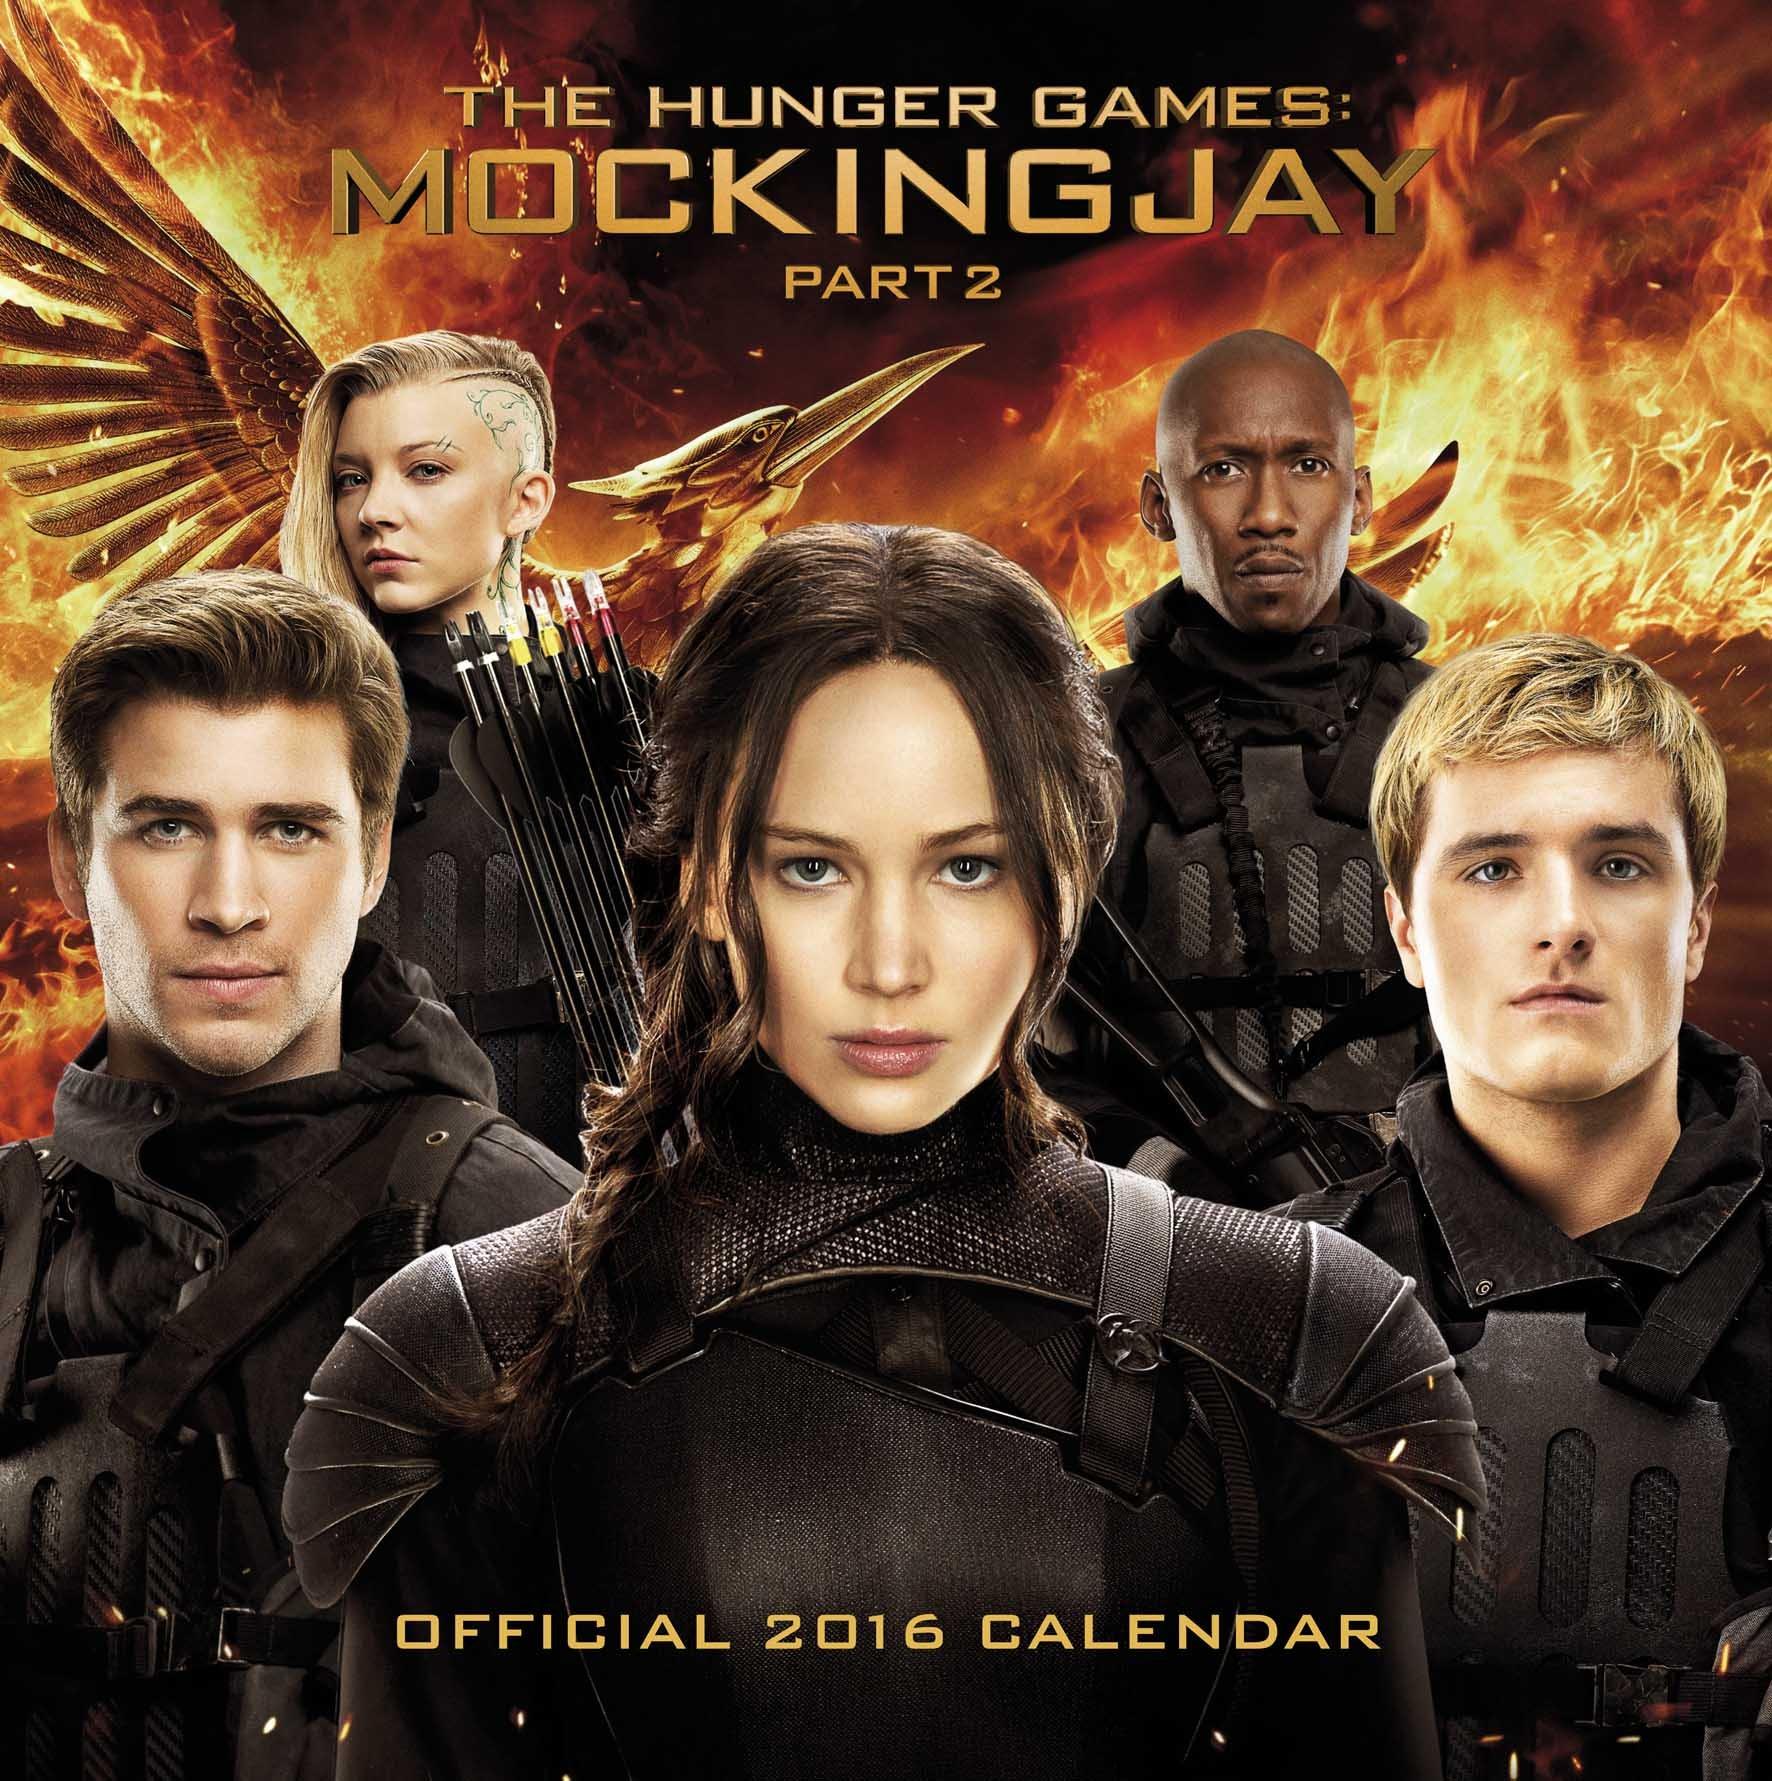 The Official The Hunger Games Mockingjay 2016 Calendar Part 2